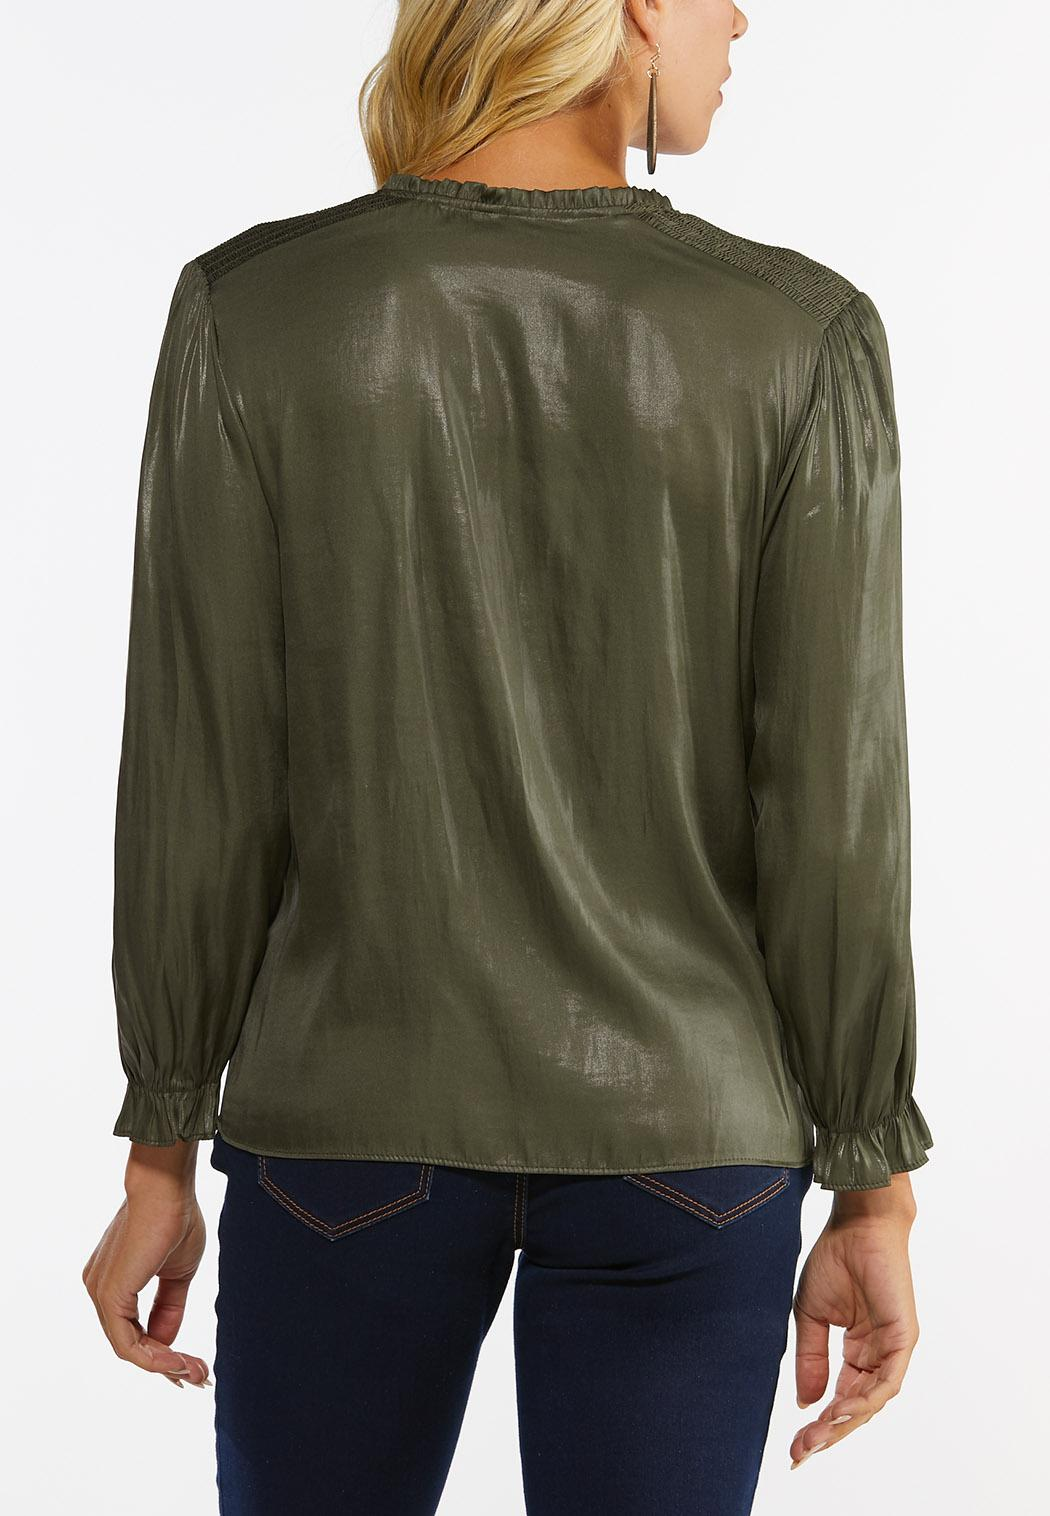 Plus Size Faux Leather Poet Top (Item #44452233)